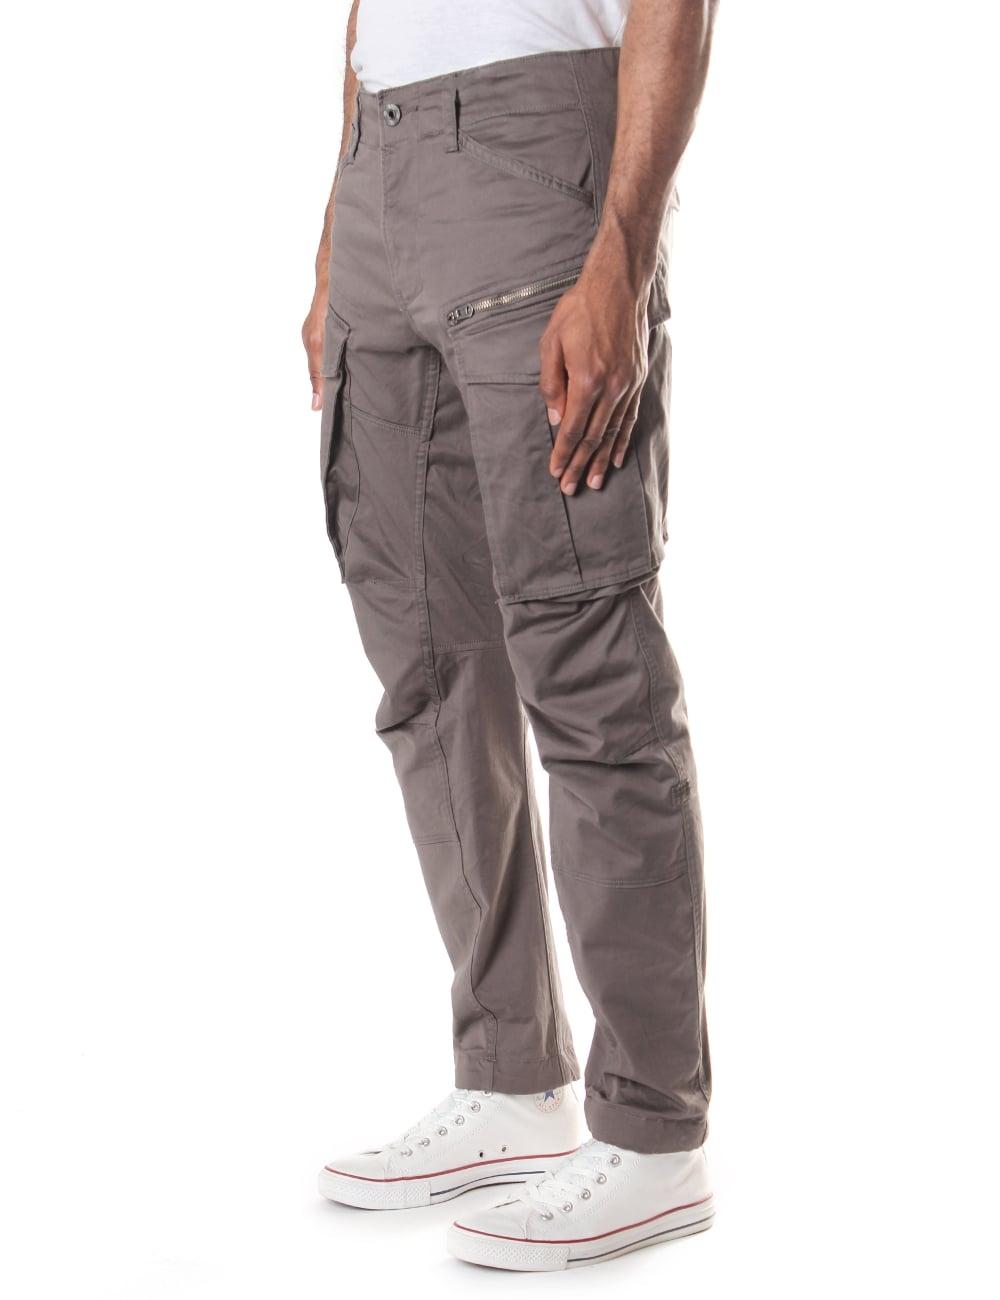 74025127b0cc3 G-Star Raw Men s Rovic Zip 3D Tapered Premium Micro Stretch Twill ...